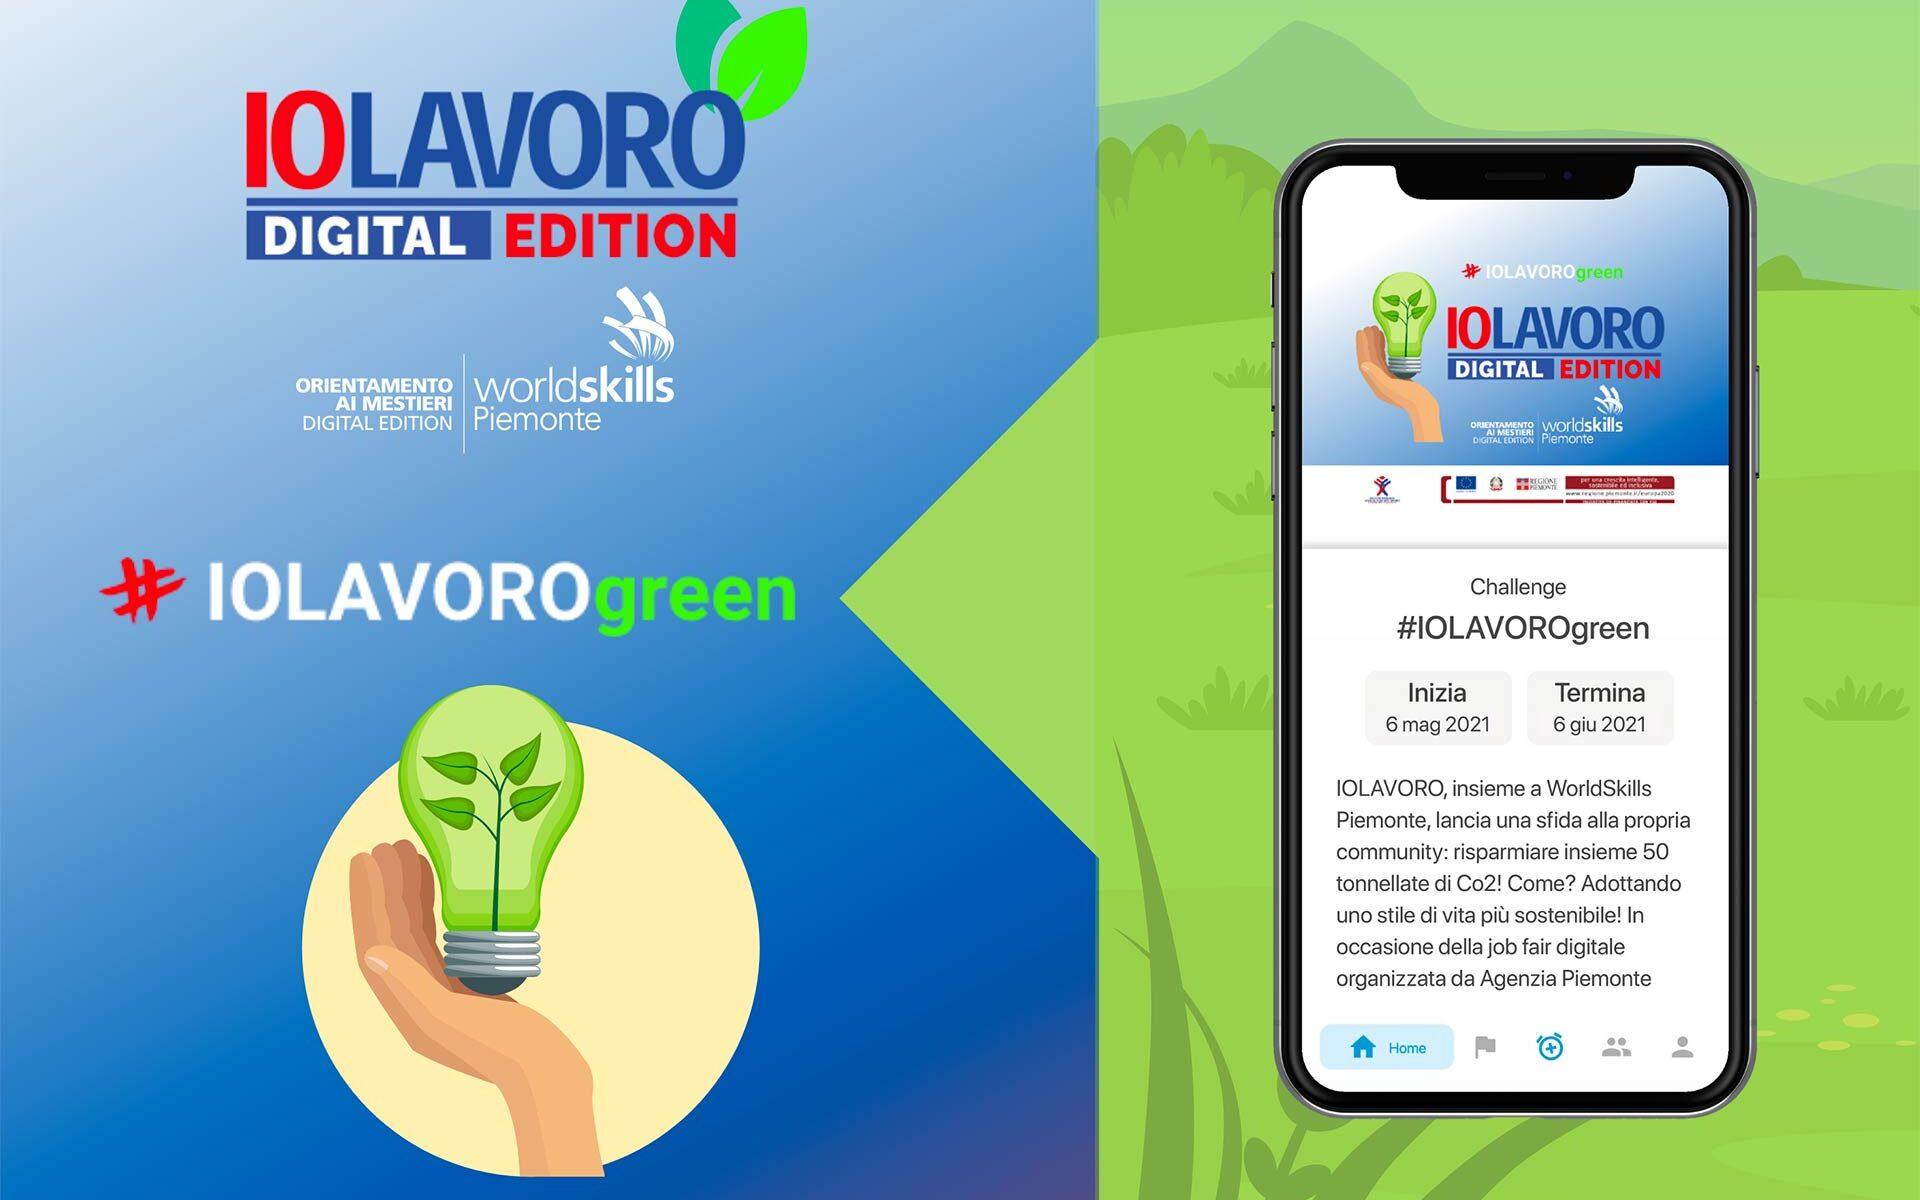 IOLAVORO#green